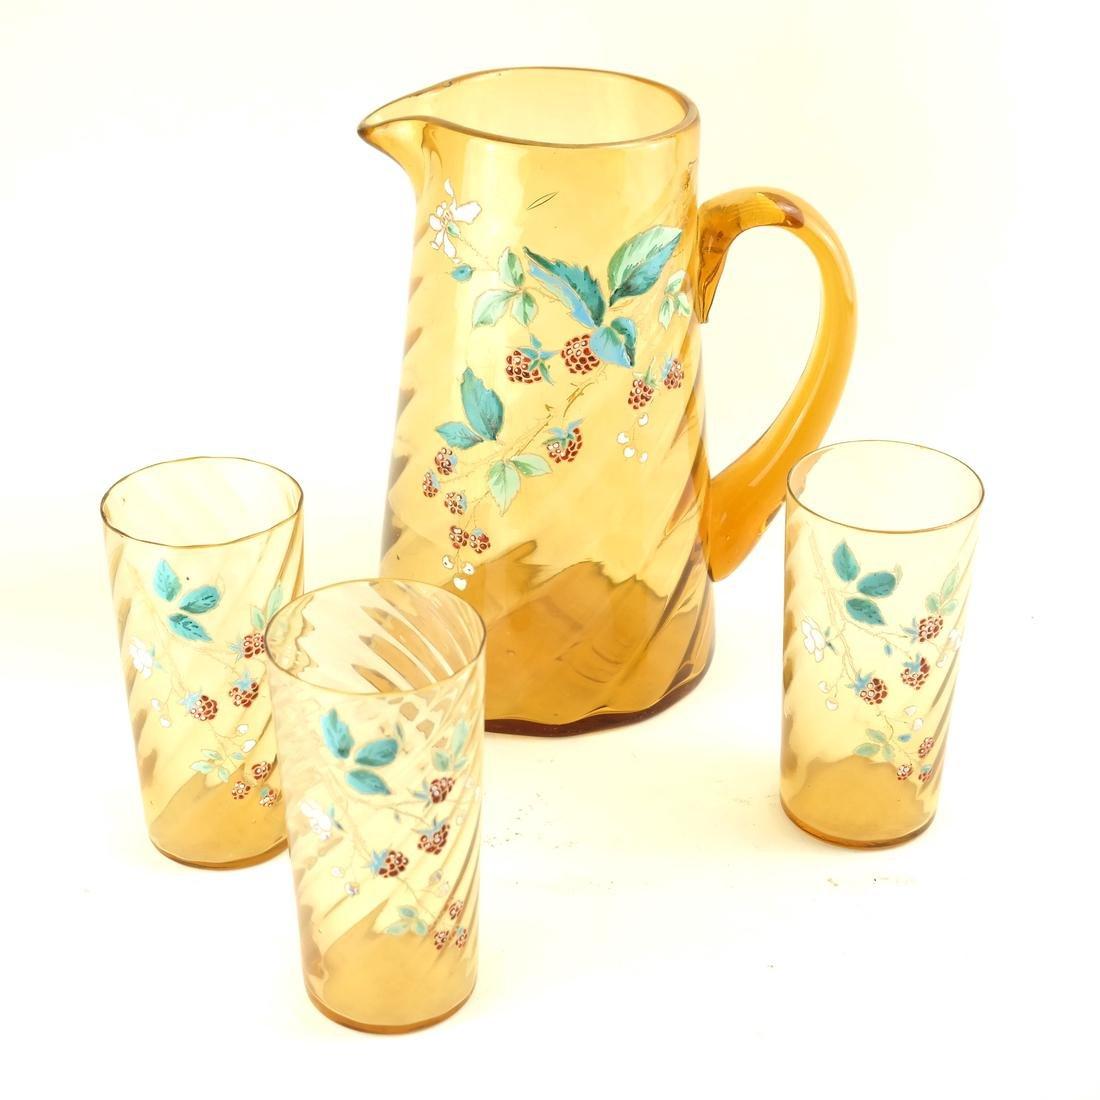 Enameled & Mold Blown Glass Iced Tea Set